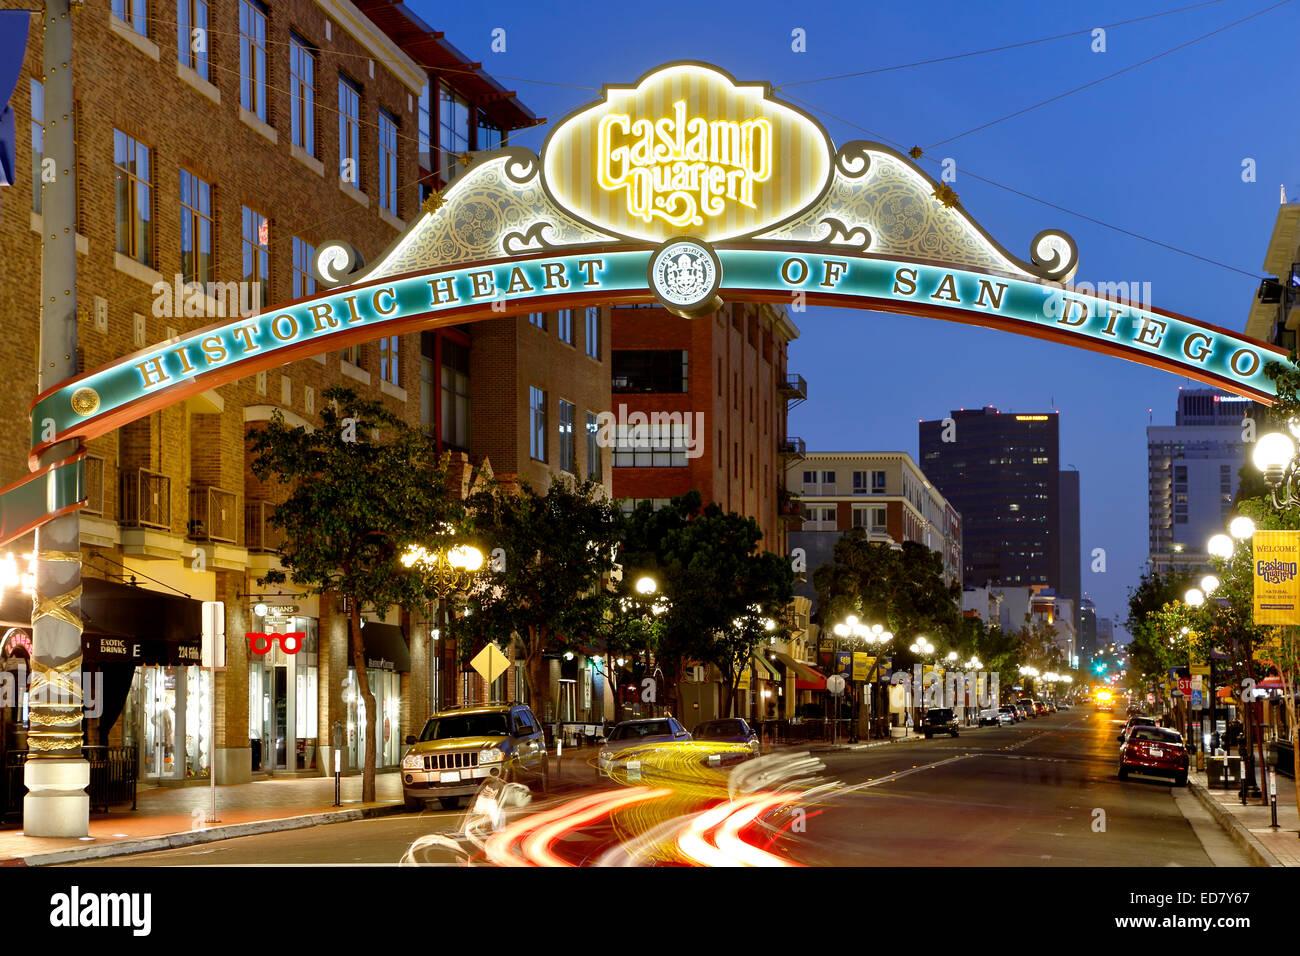 Histórico Gaslamp Quarter, San Diego, California, EE.UU. Imagen De Stock